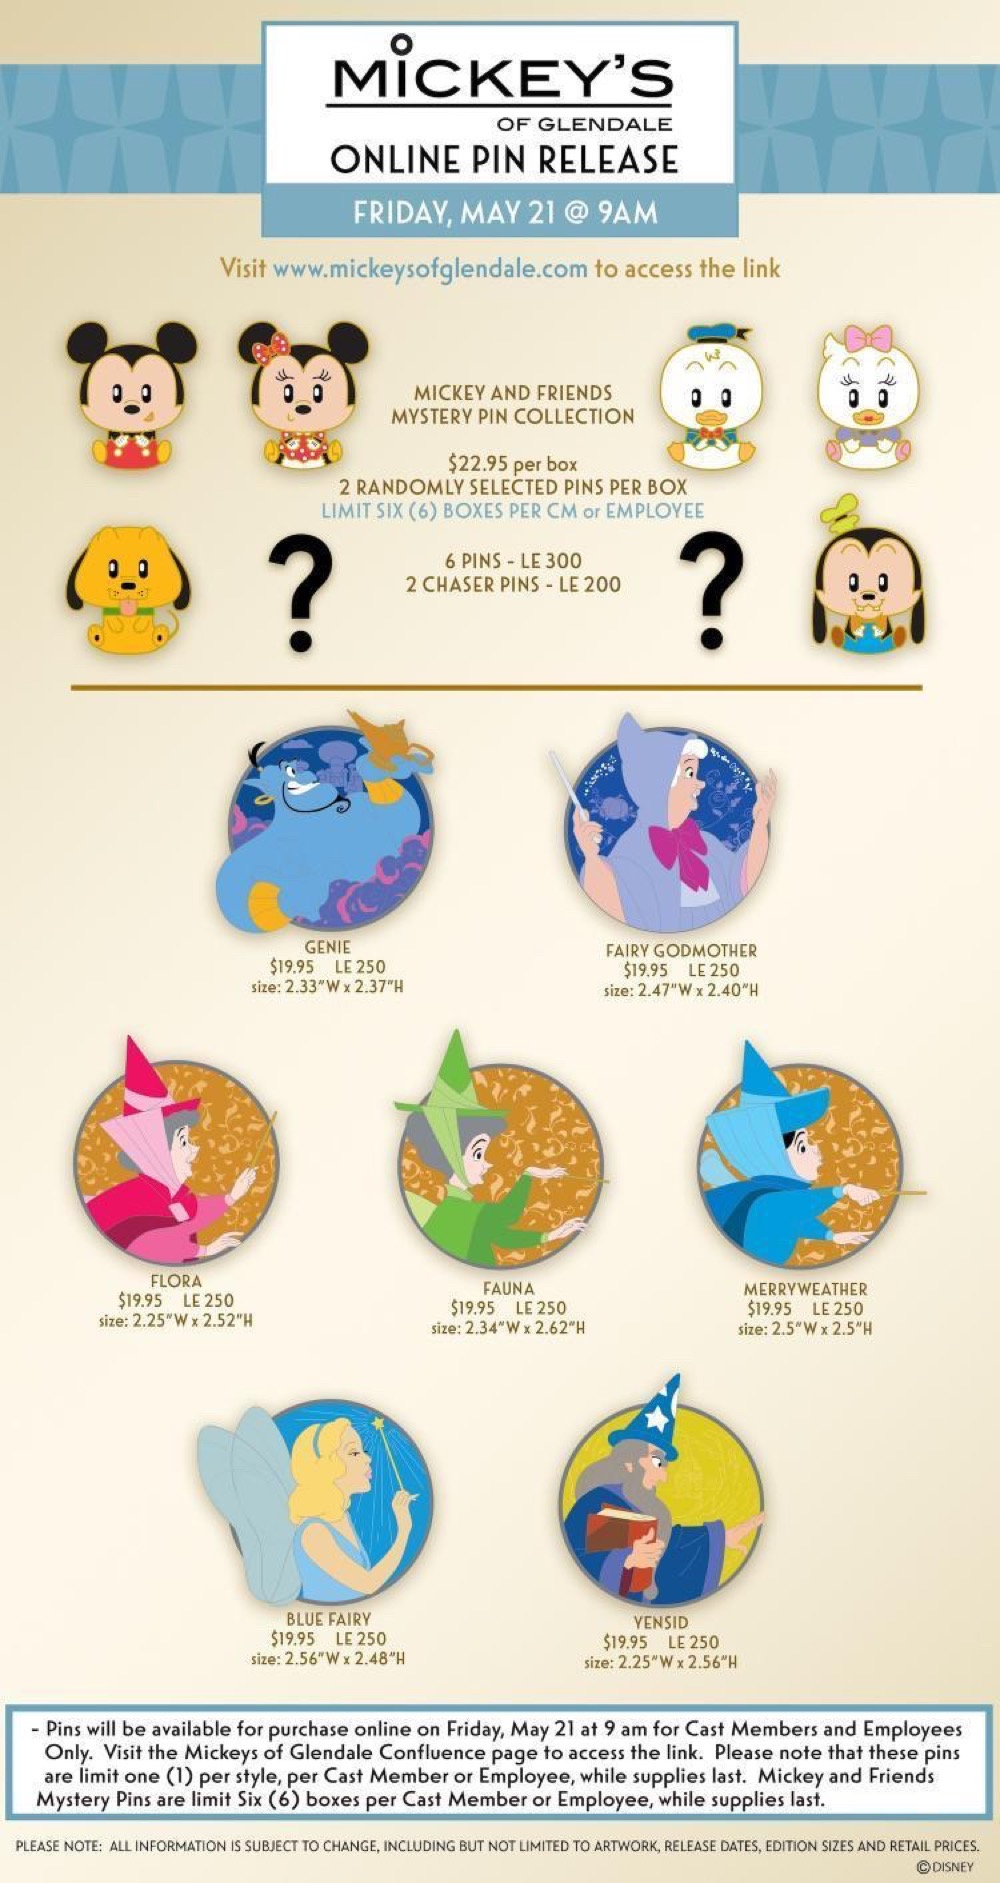 900 Disney Ideas In 2021 Brave Little Toaster Disney Pepper Ann